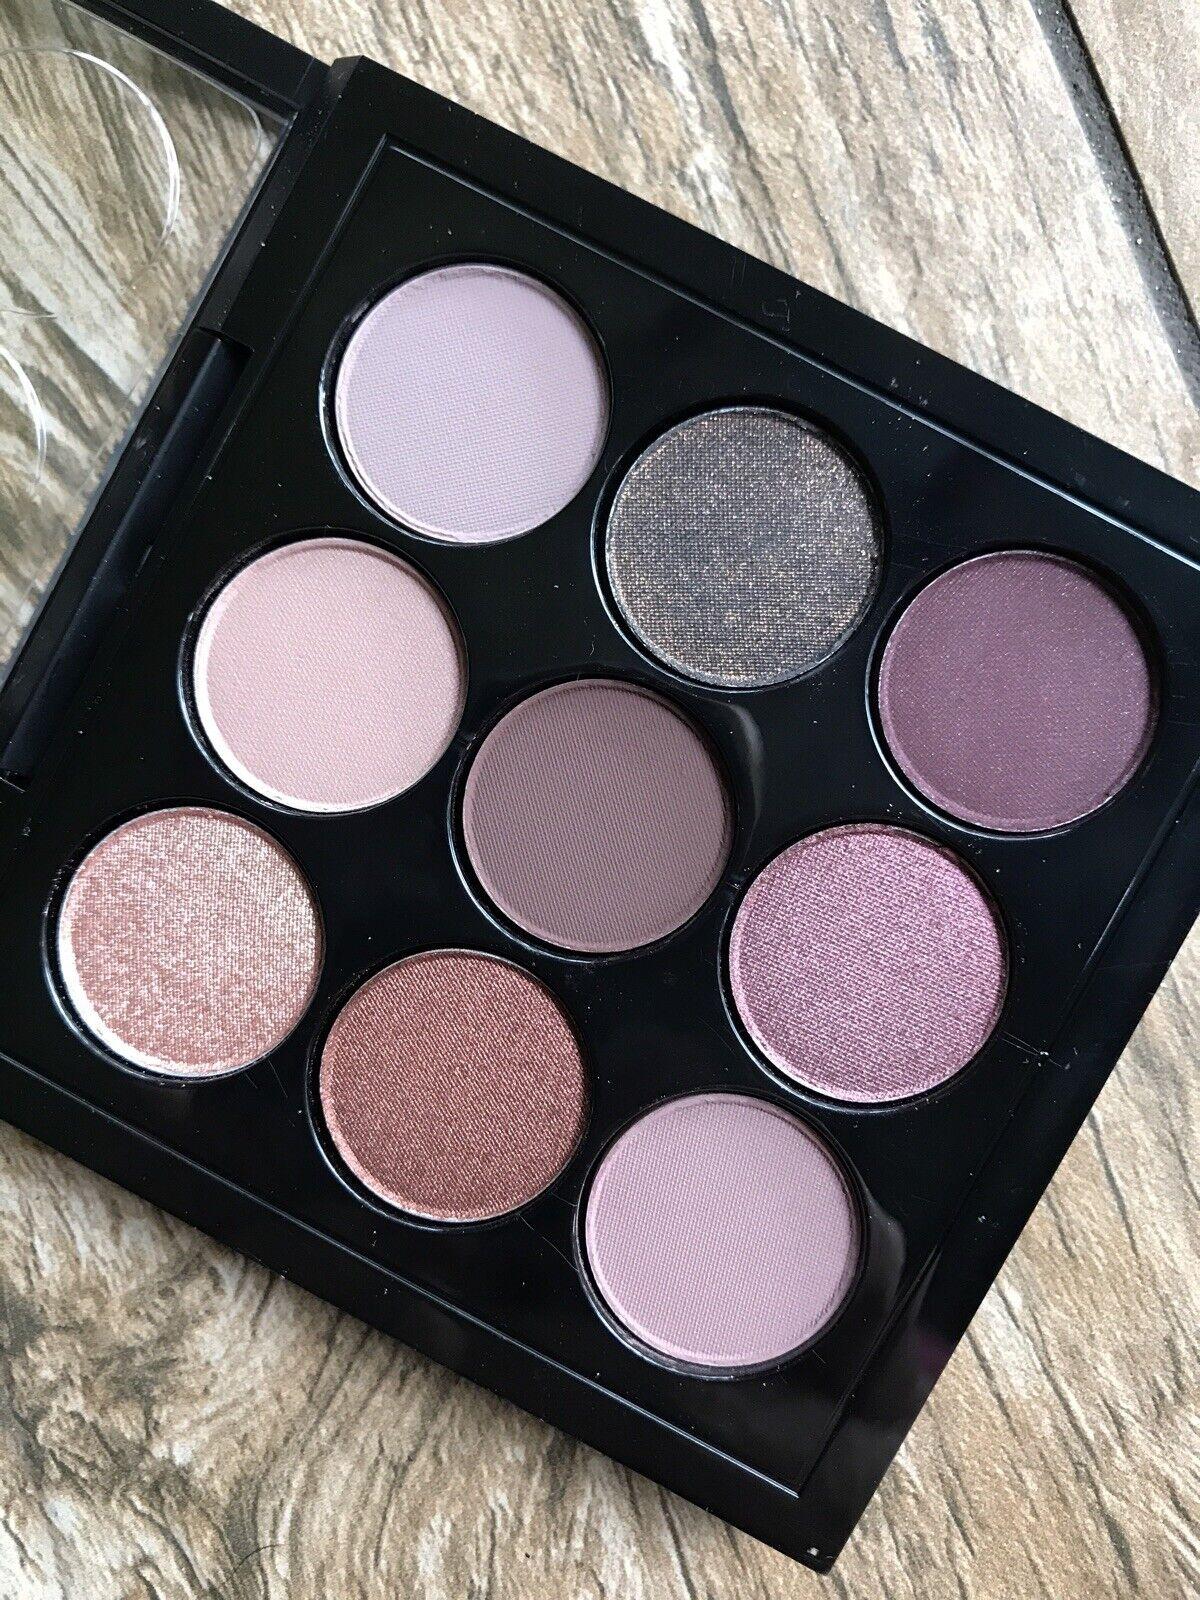 MAC 'Burgundy Times Nine' Eyeshadow Palette - Burgundy Times